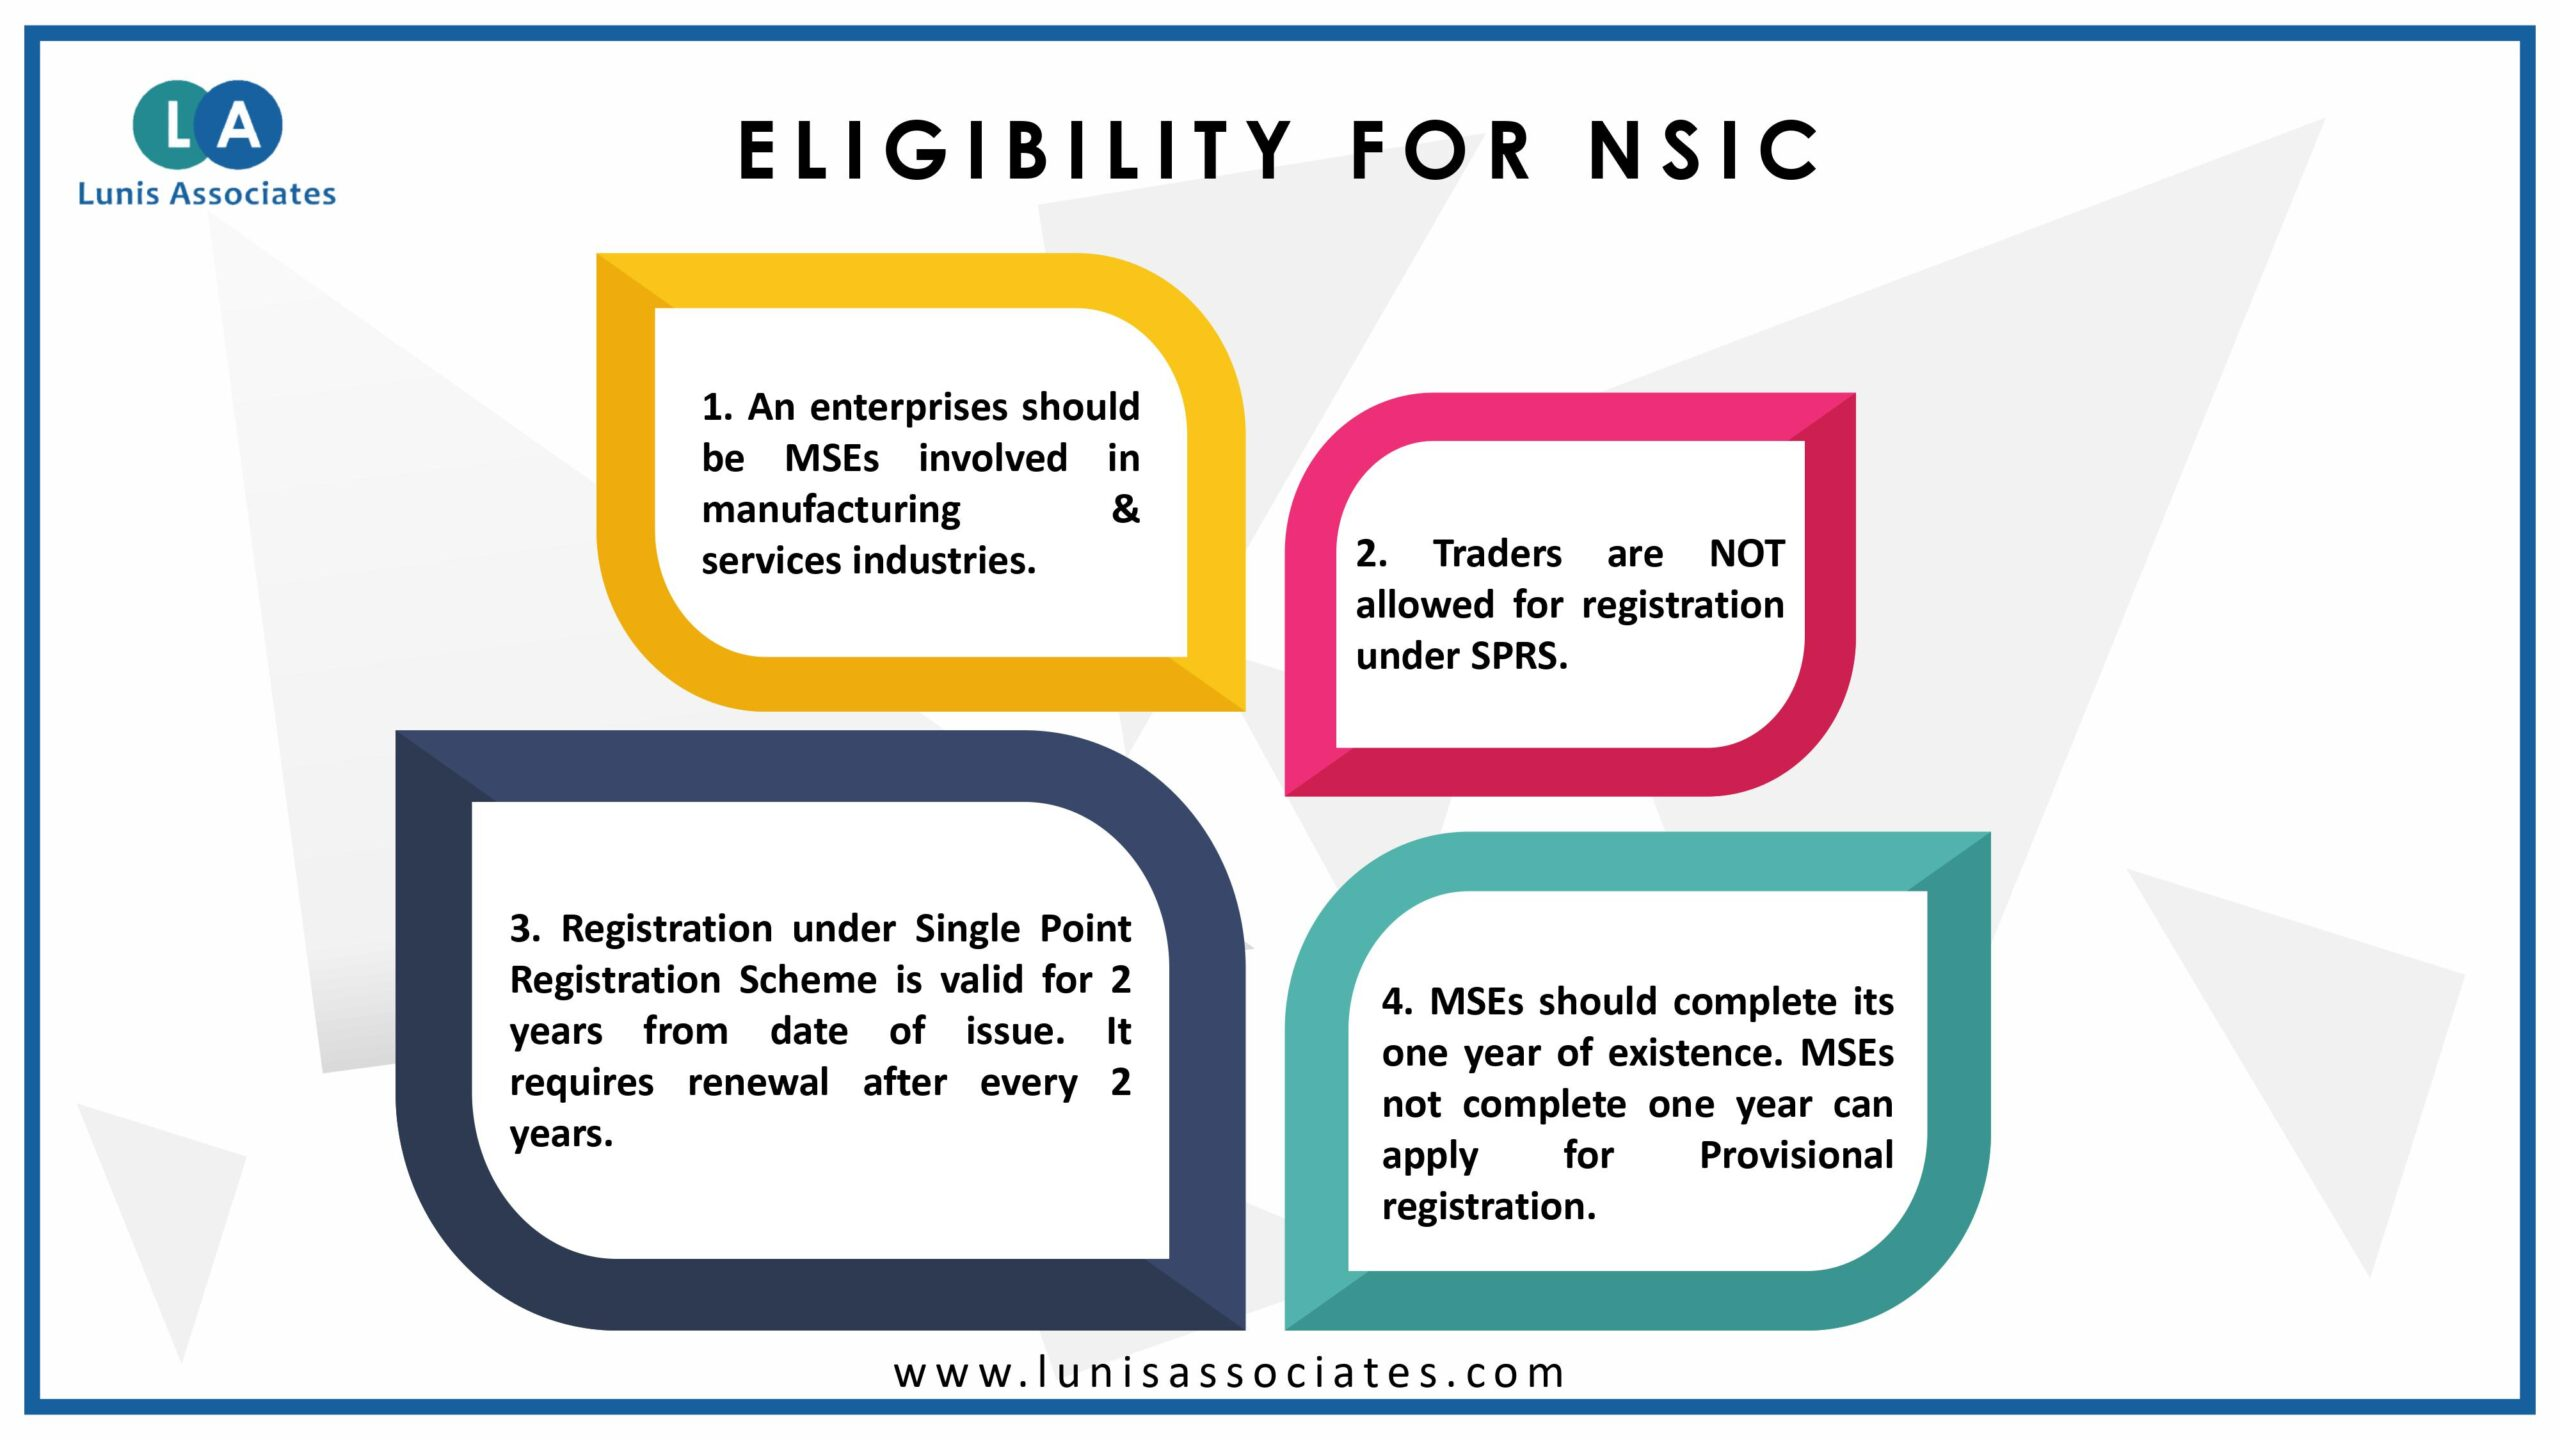 Eligibility For NSIC Registration